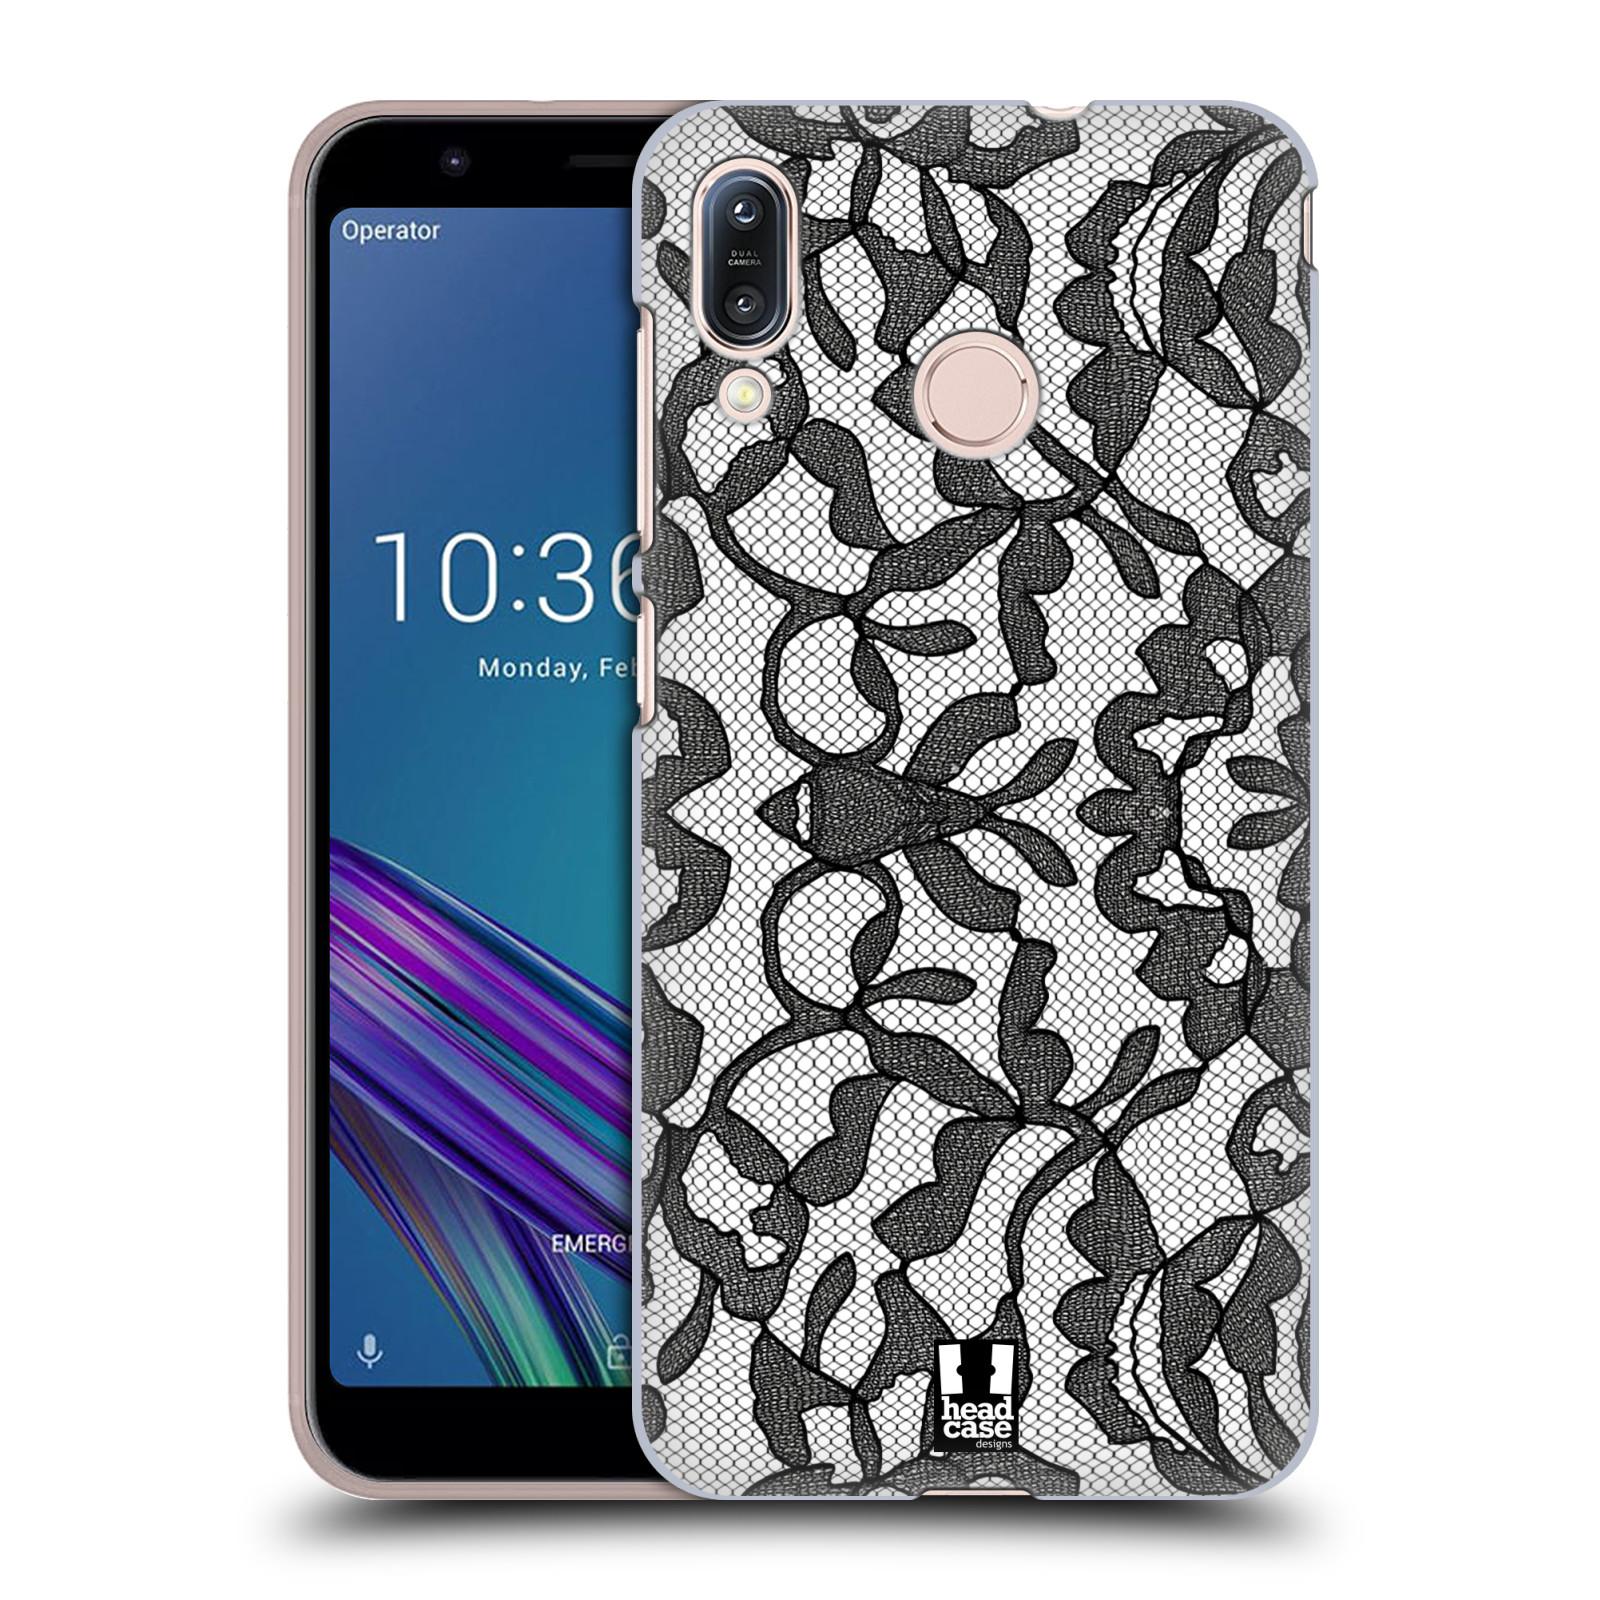 Plastové pouzdro na mobil Asus Zenfone Max M1 ZB555KL - Head Case - LEAFY KRAJKA